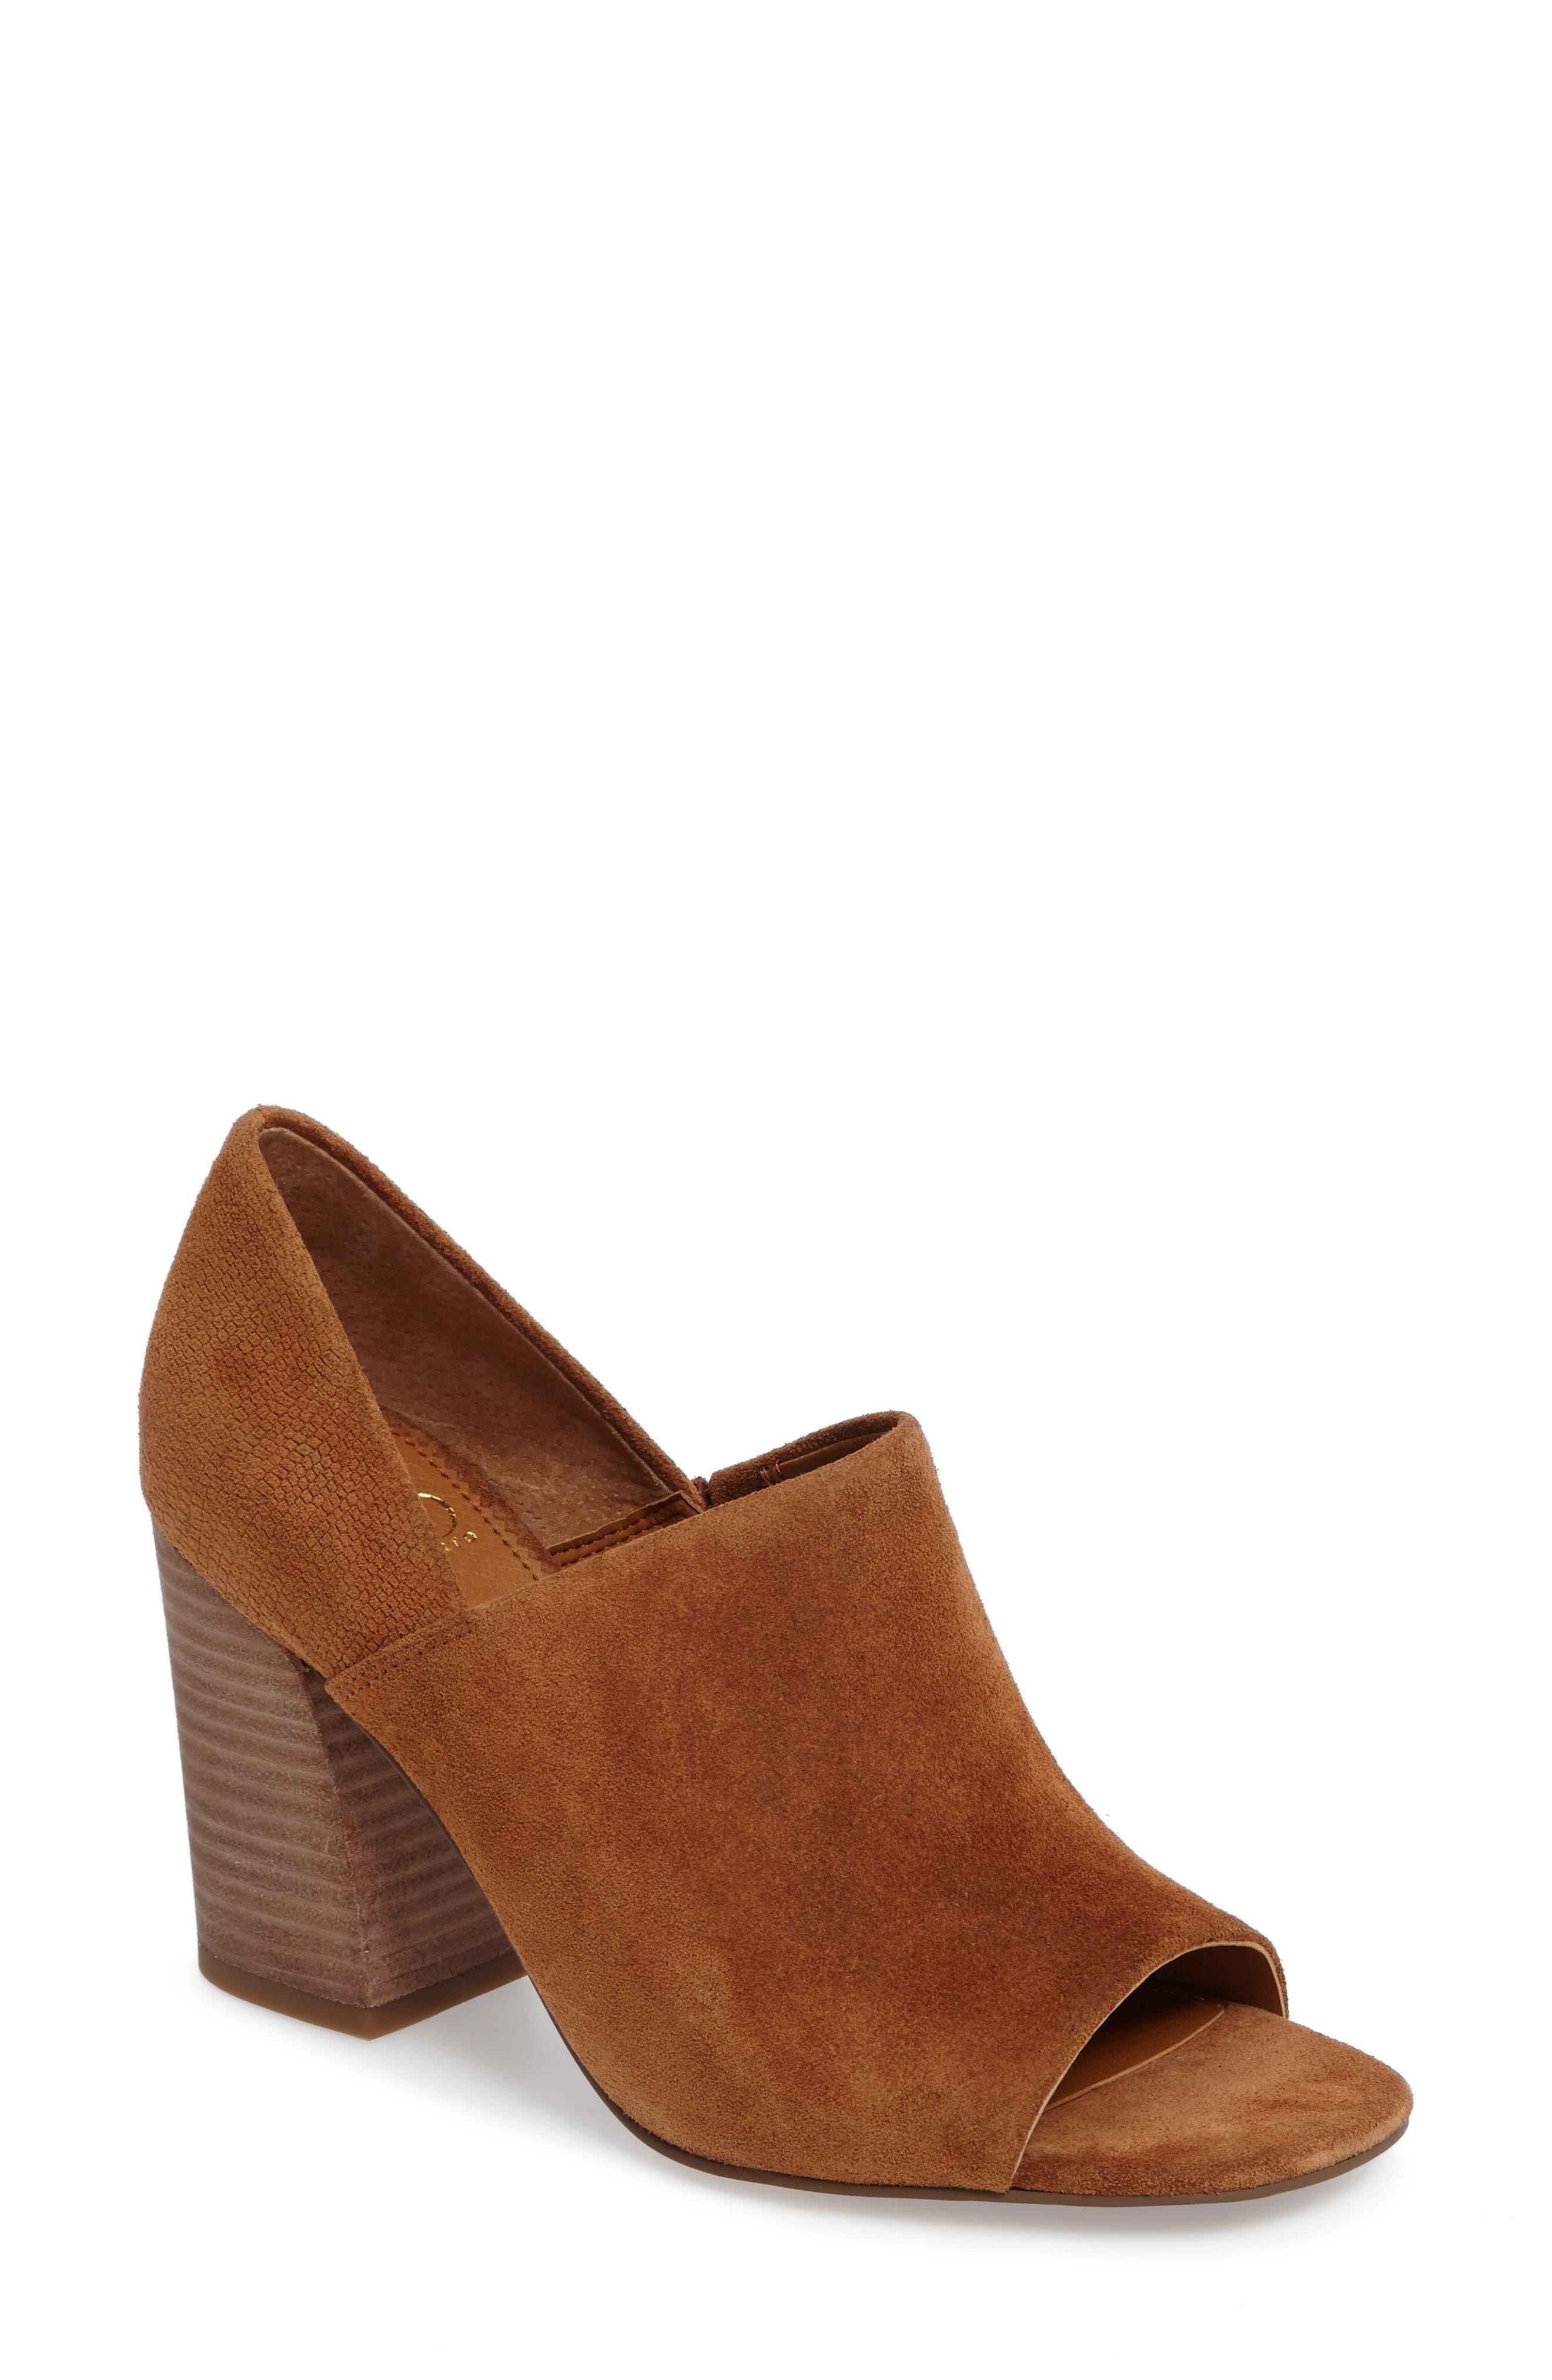 Alternate Image 1 Selected - SARTO by Franco Sarto Ellison Block Heel Sandal (Women)